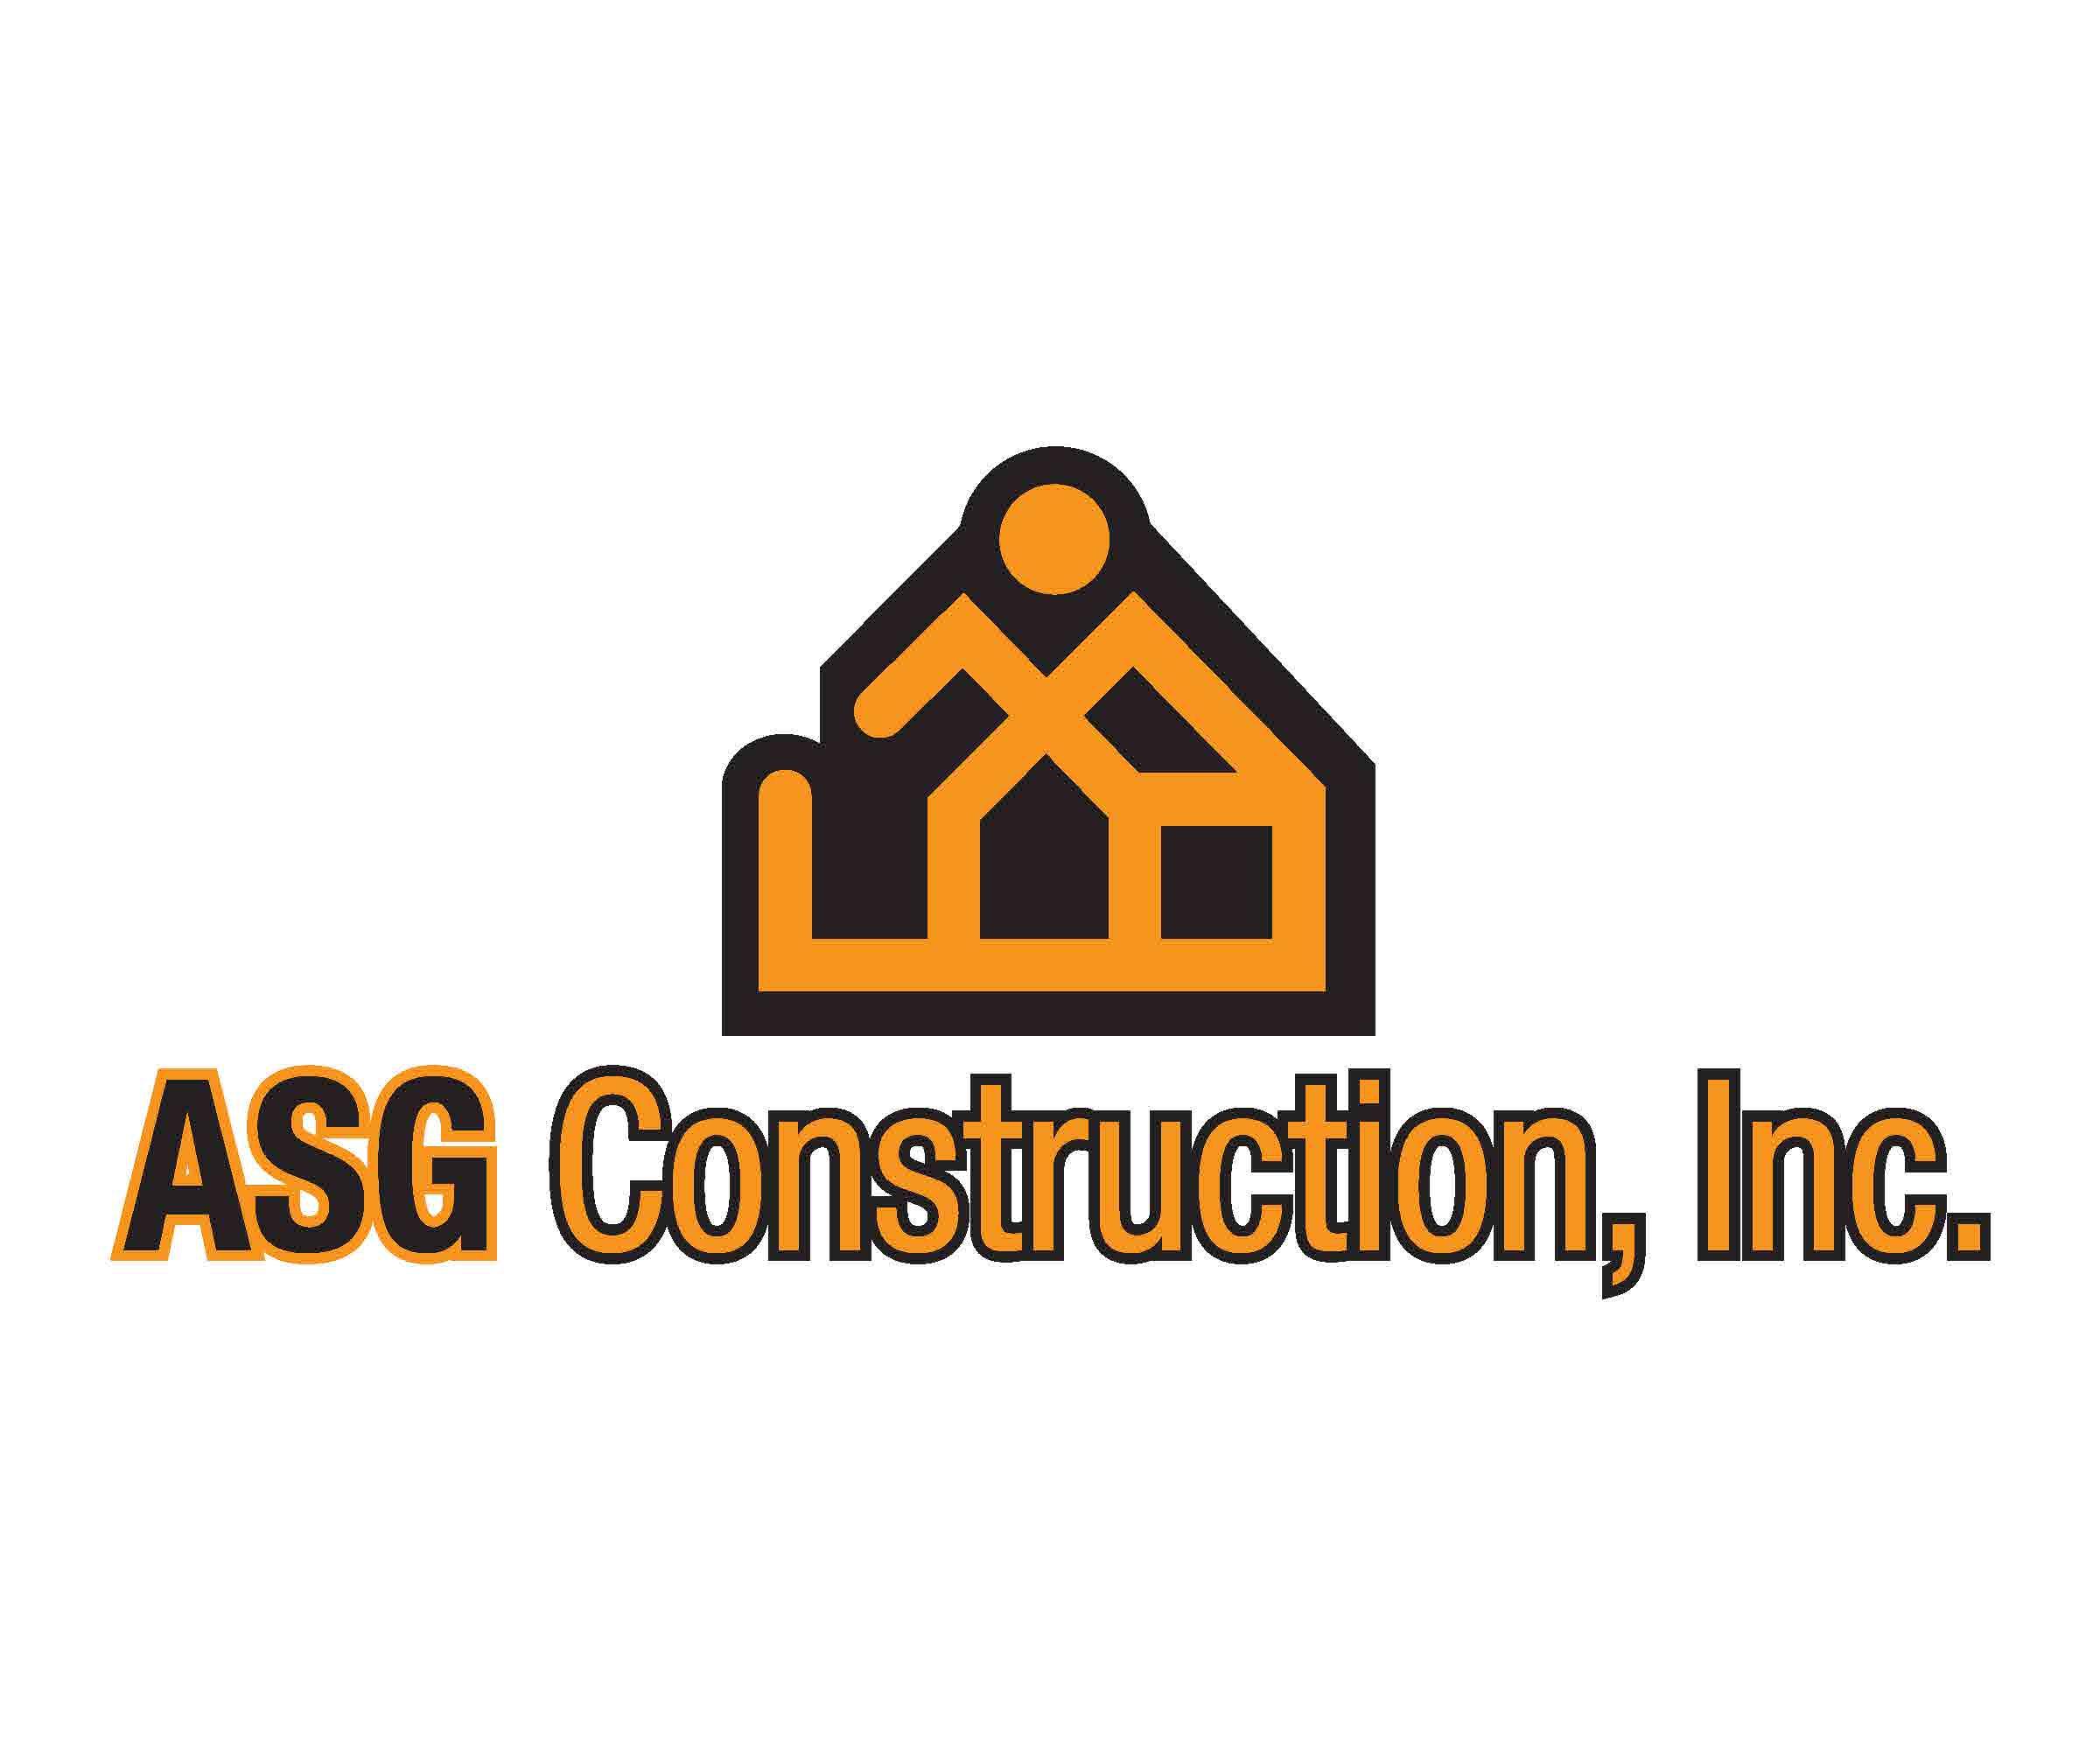 ASG Construction logo-orange-black_FINAL_jpg (1)